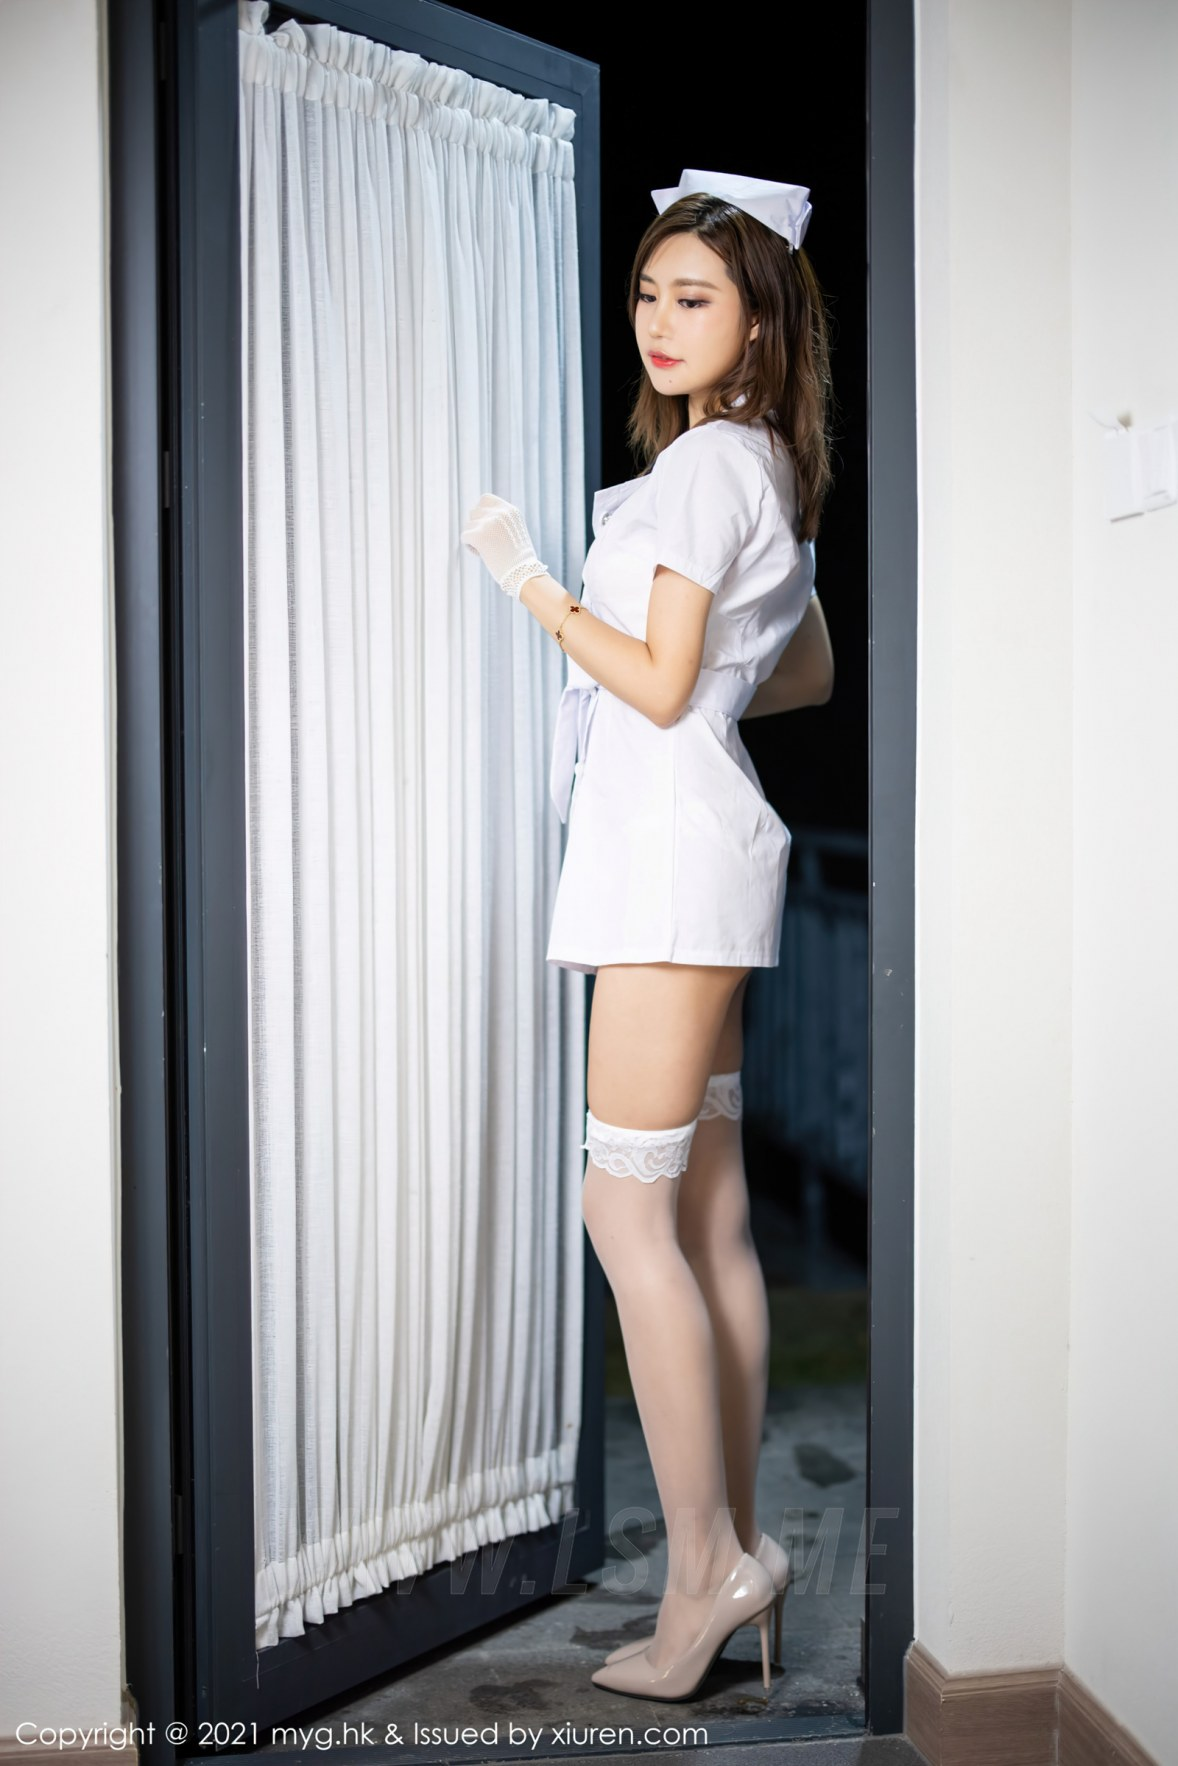 MyGirl 美媛馆 Vol.578 护士制服主题 绮里嘉Carina 杭州旅拍111 - 4